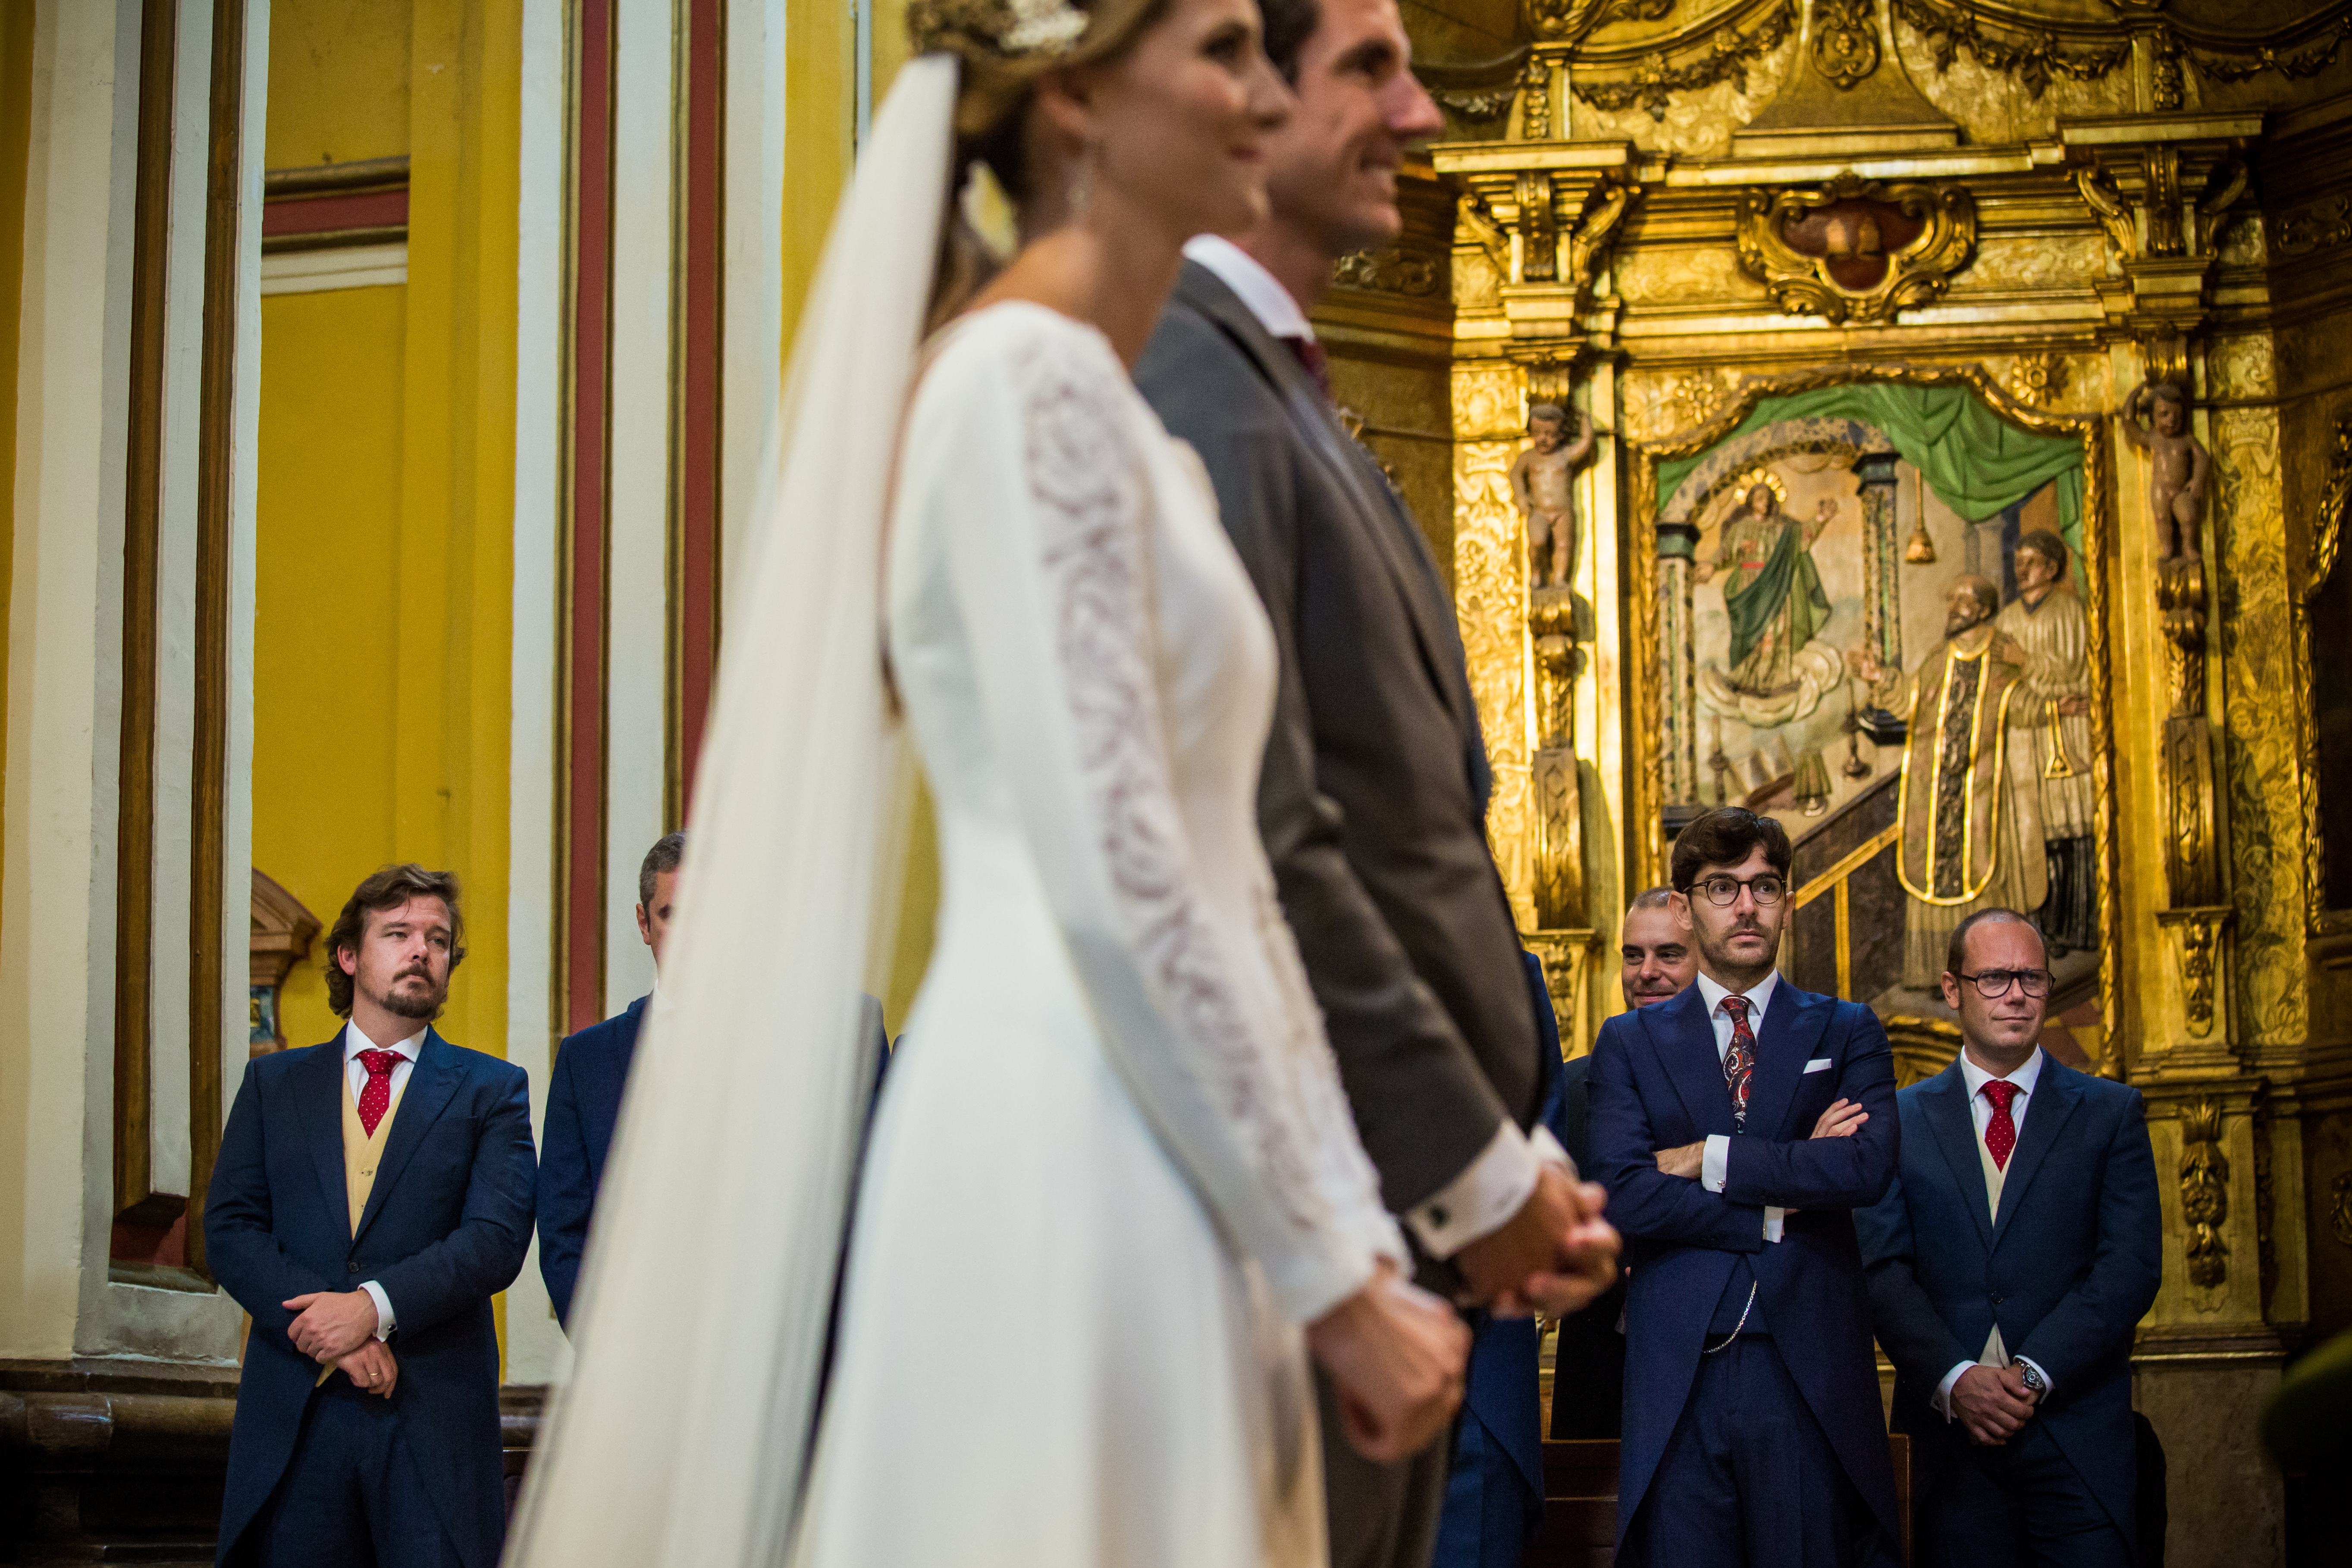 mandarina weddig, fotografos de boda, fotografo boda soria, fotografo boda barcelona, fotografo boda Madrid, fotografo boda lerida, fotografo boda Huesca_05